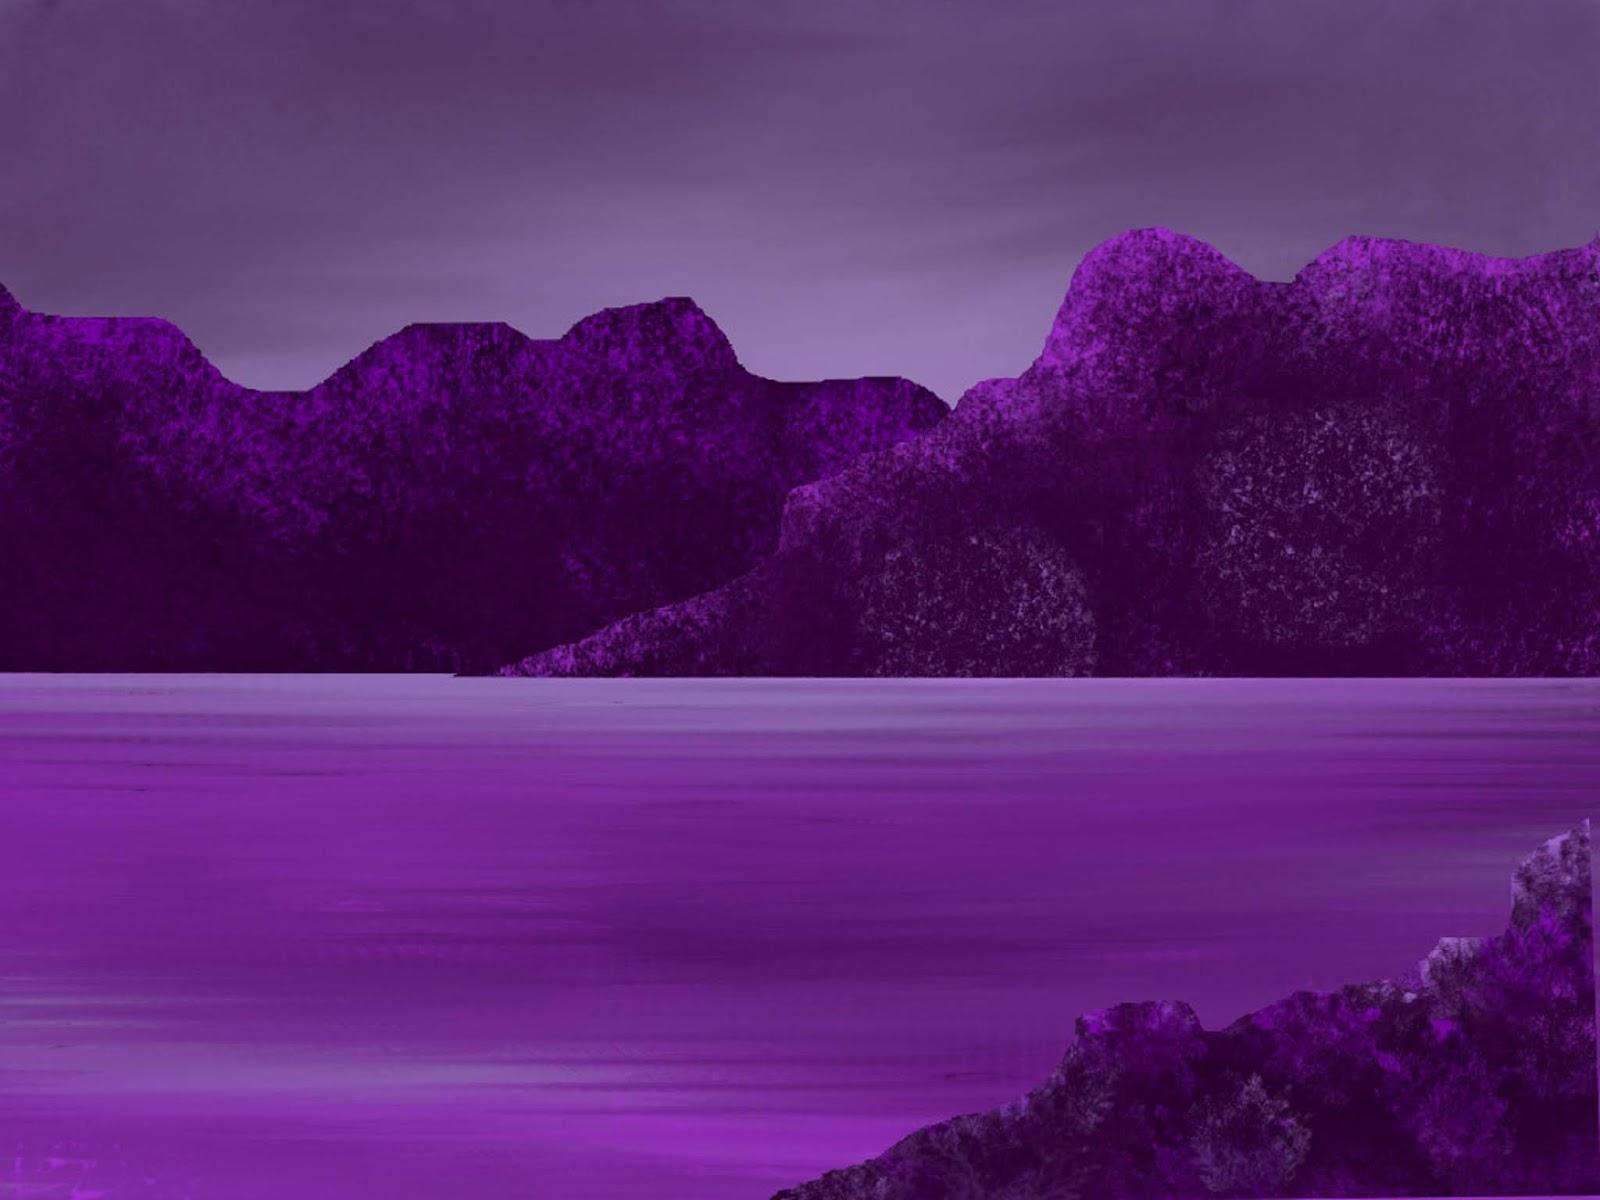 Purple Mountains At Sea